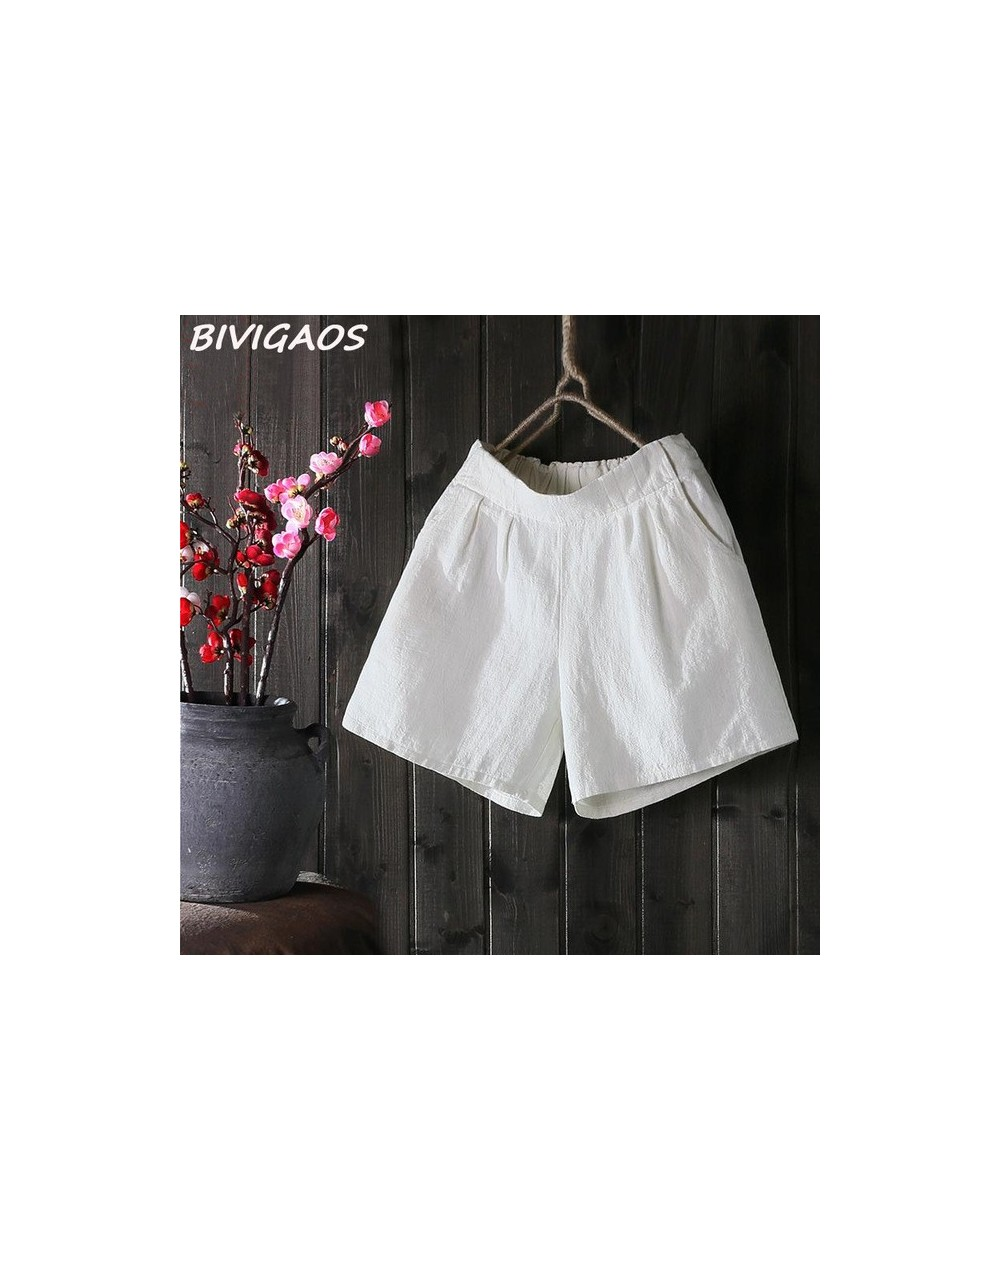 New Womens Summer Loose Cotton Linen Shorts Femme Elastic High Waist Wide Leg Short Shorts Casual Short Fashion - White - 49...